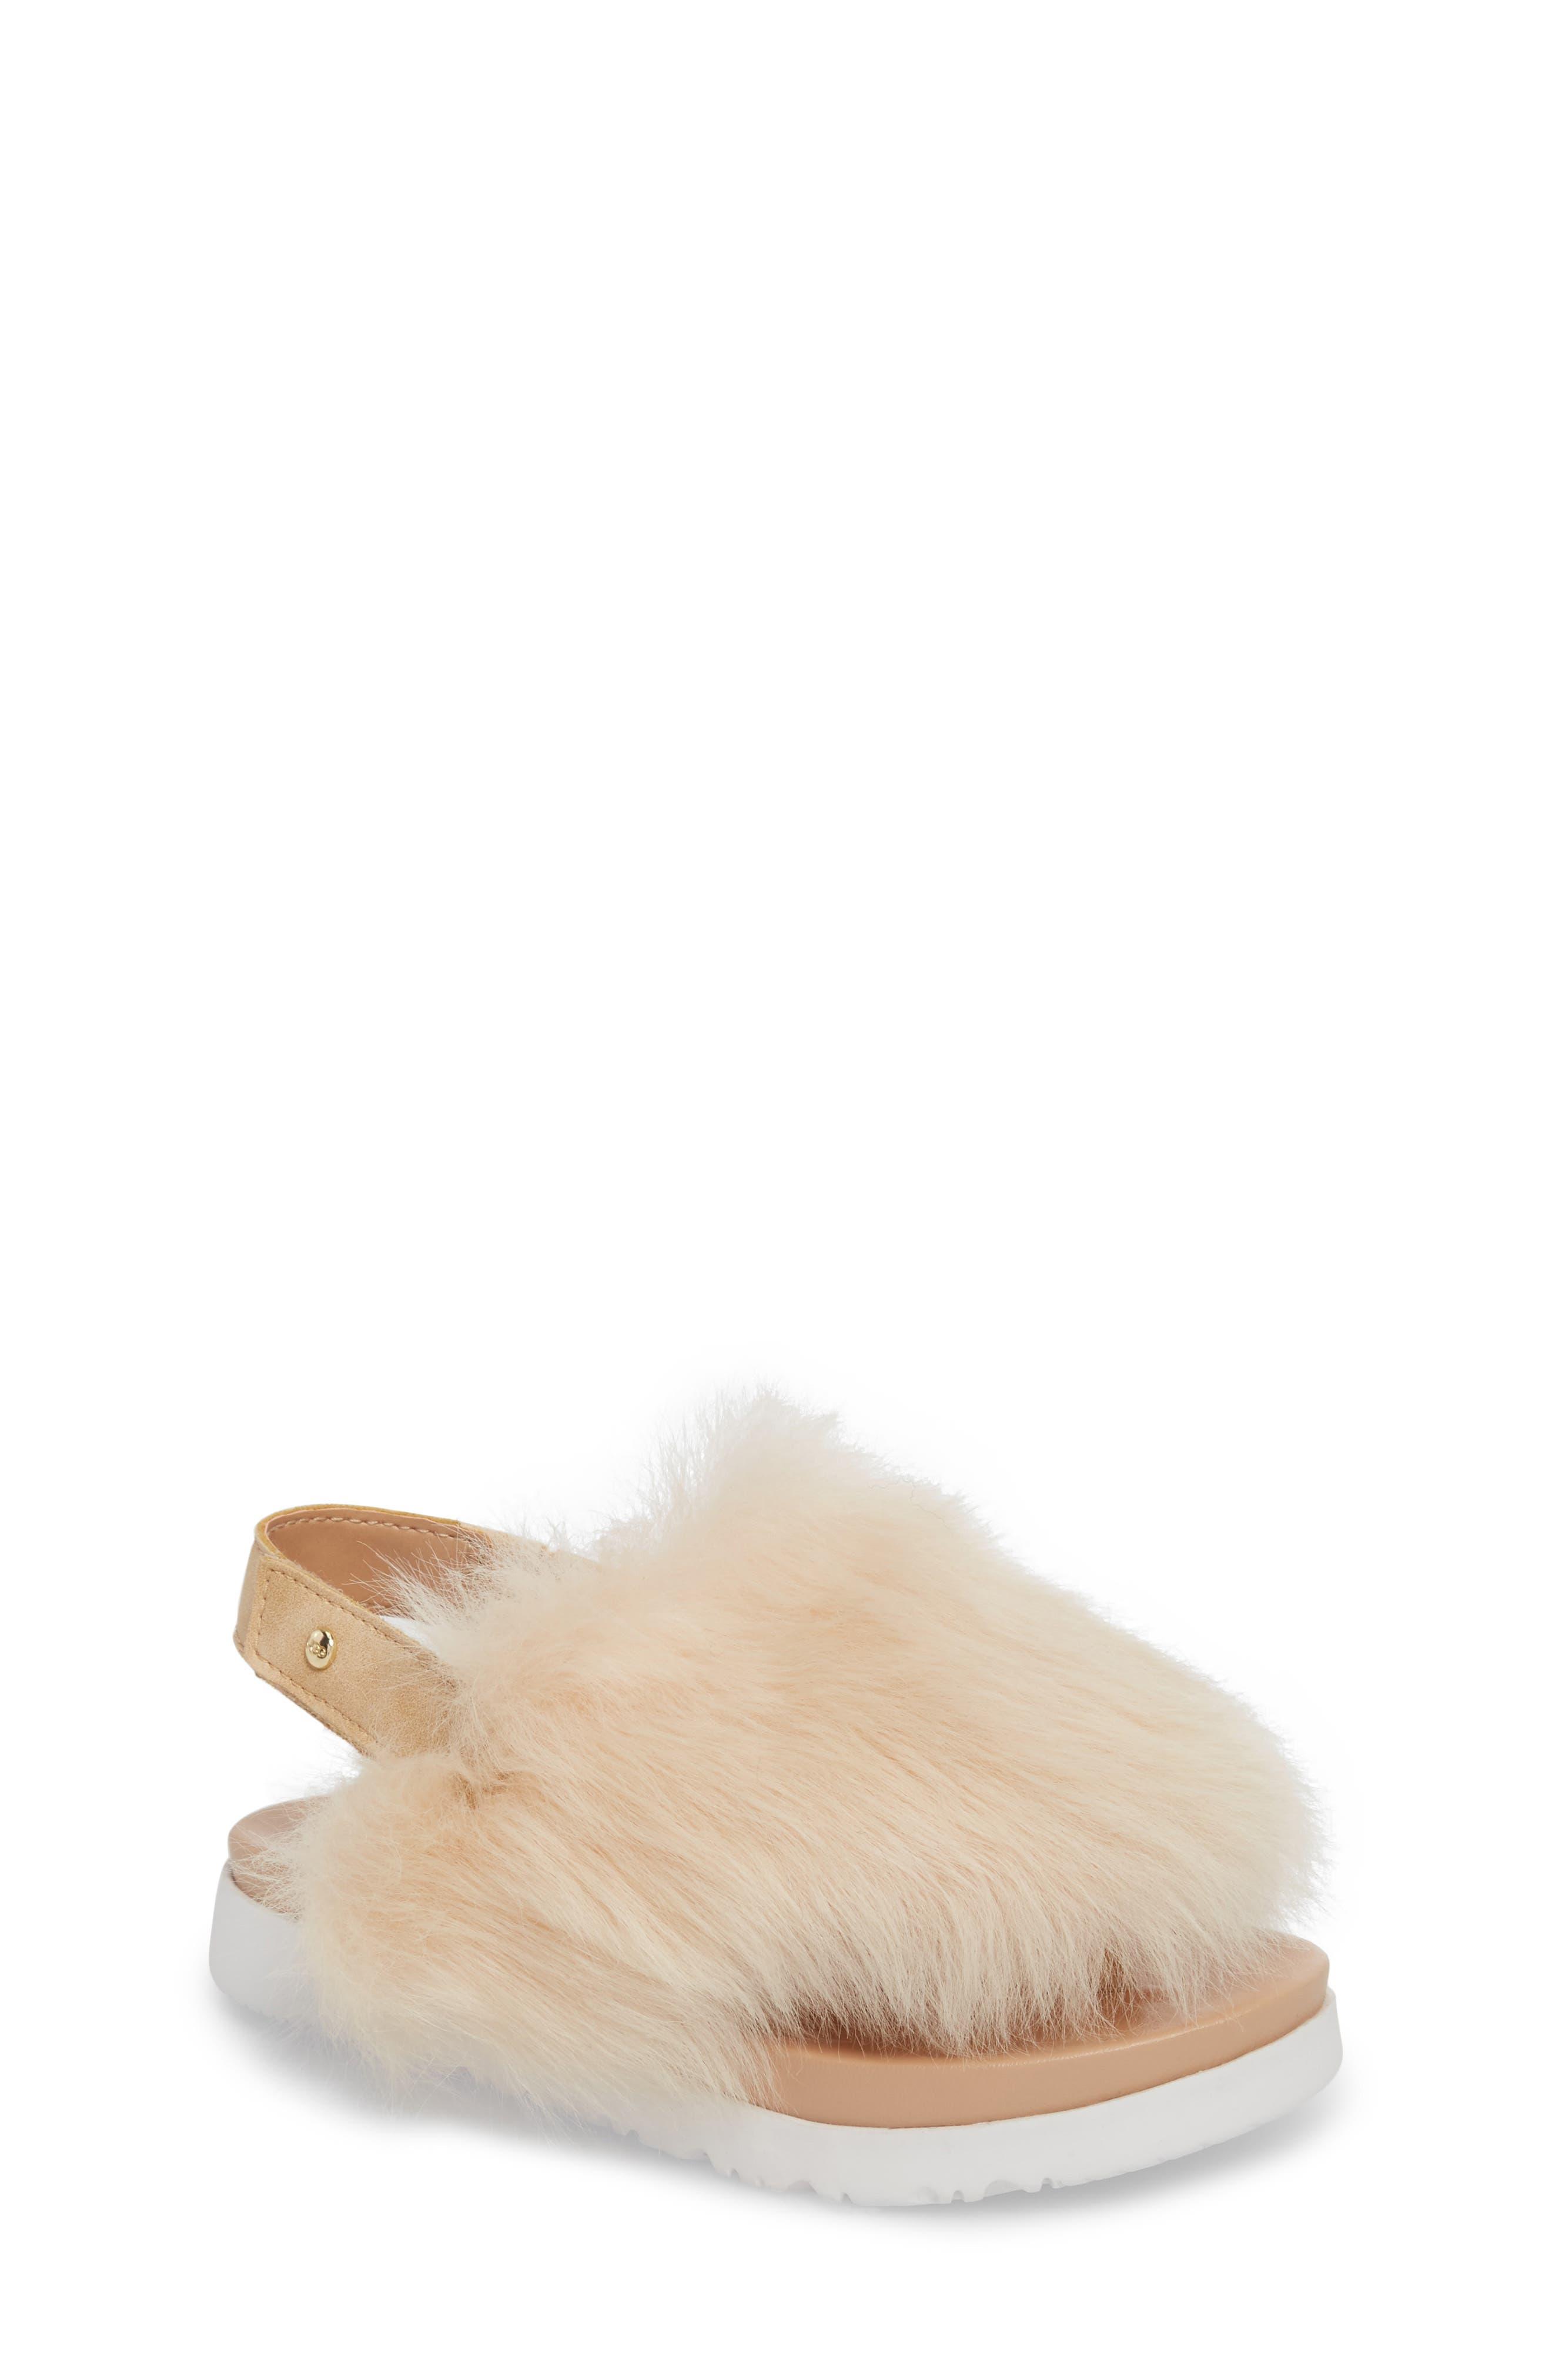 UGG<SUP>®</SUP>, Holly Genuine Shearling Sandal, Main thumbnail 1, color, SOFT OCHRE